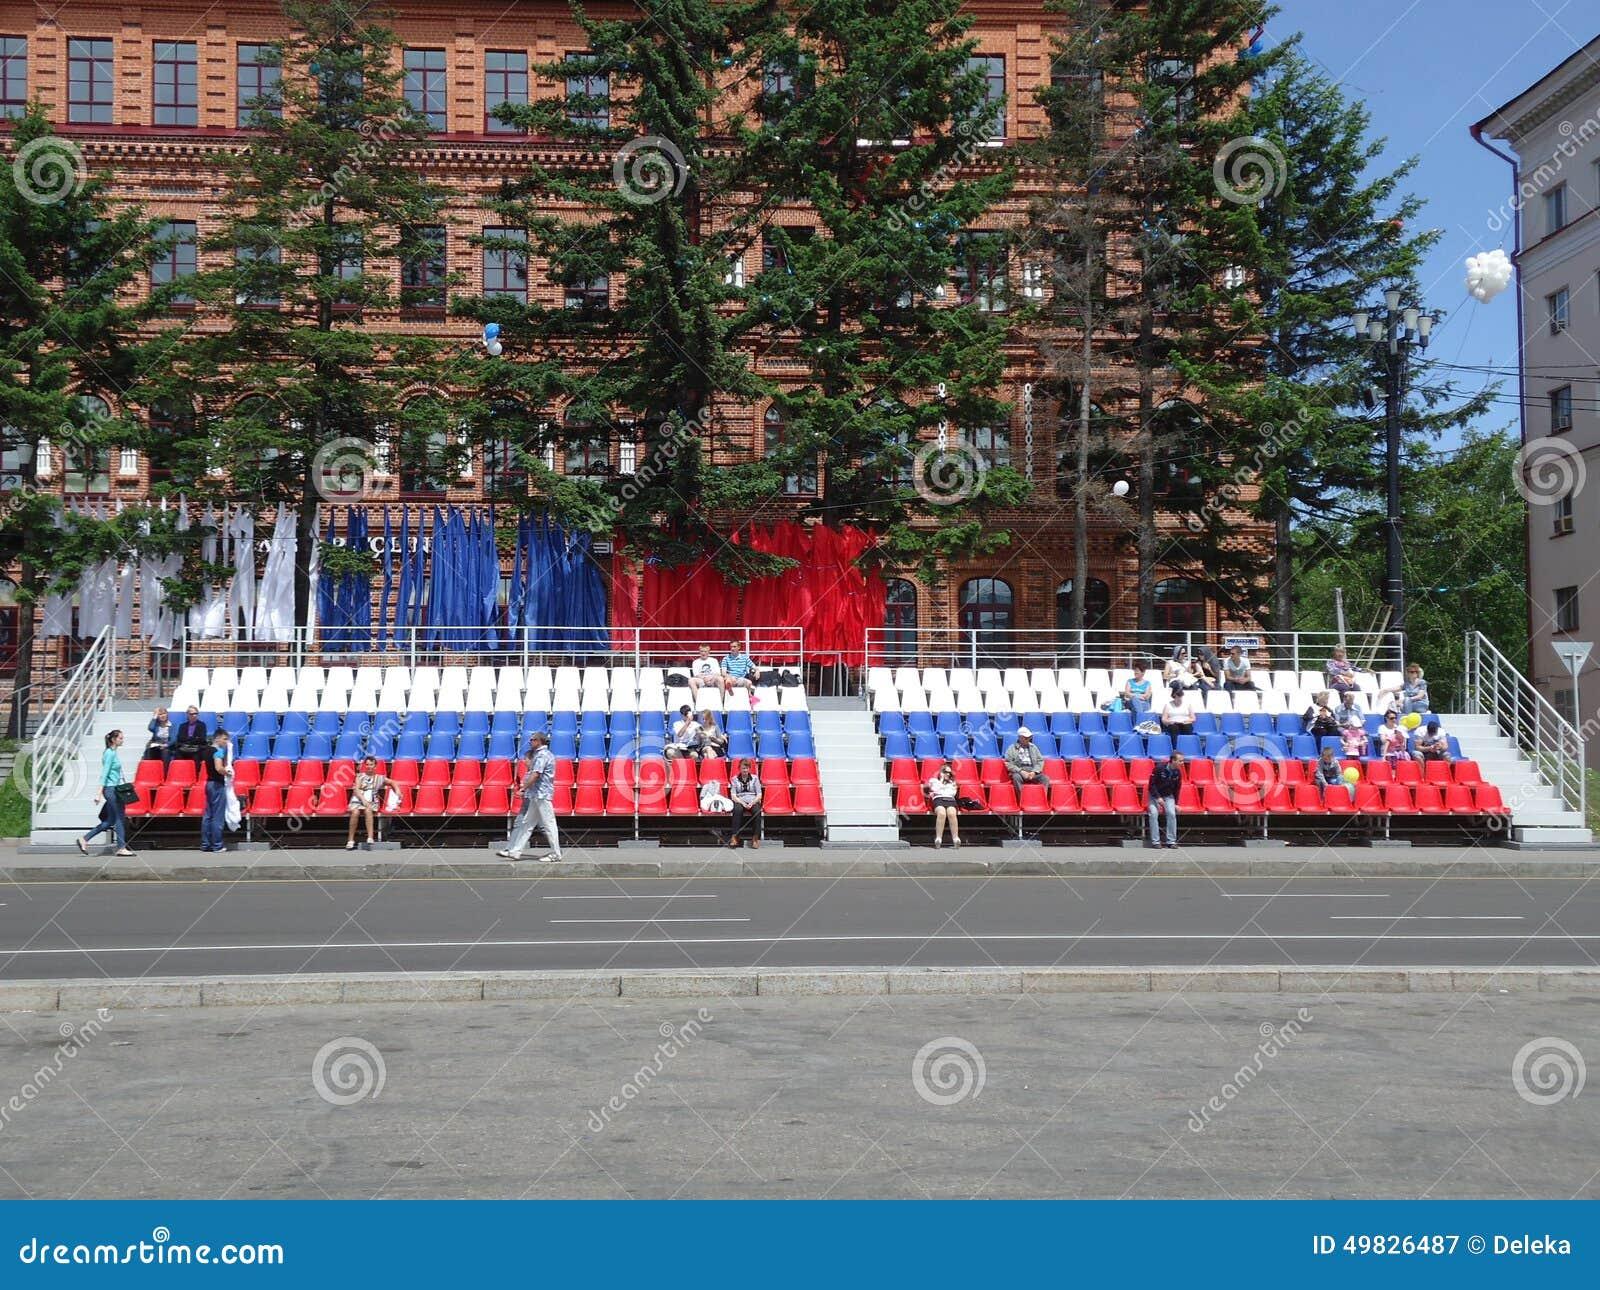 Russian Tricolor Was 77